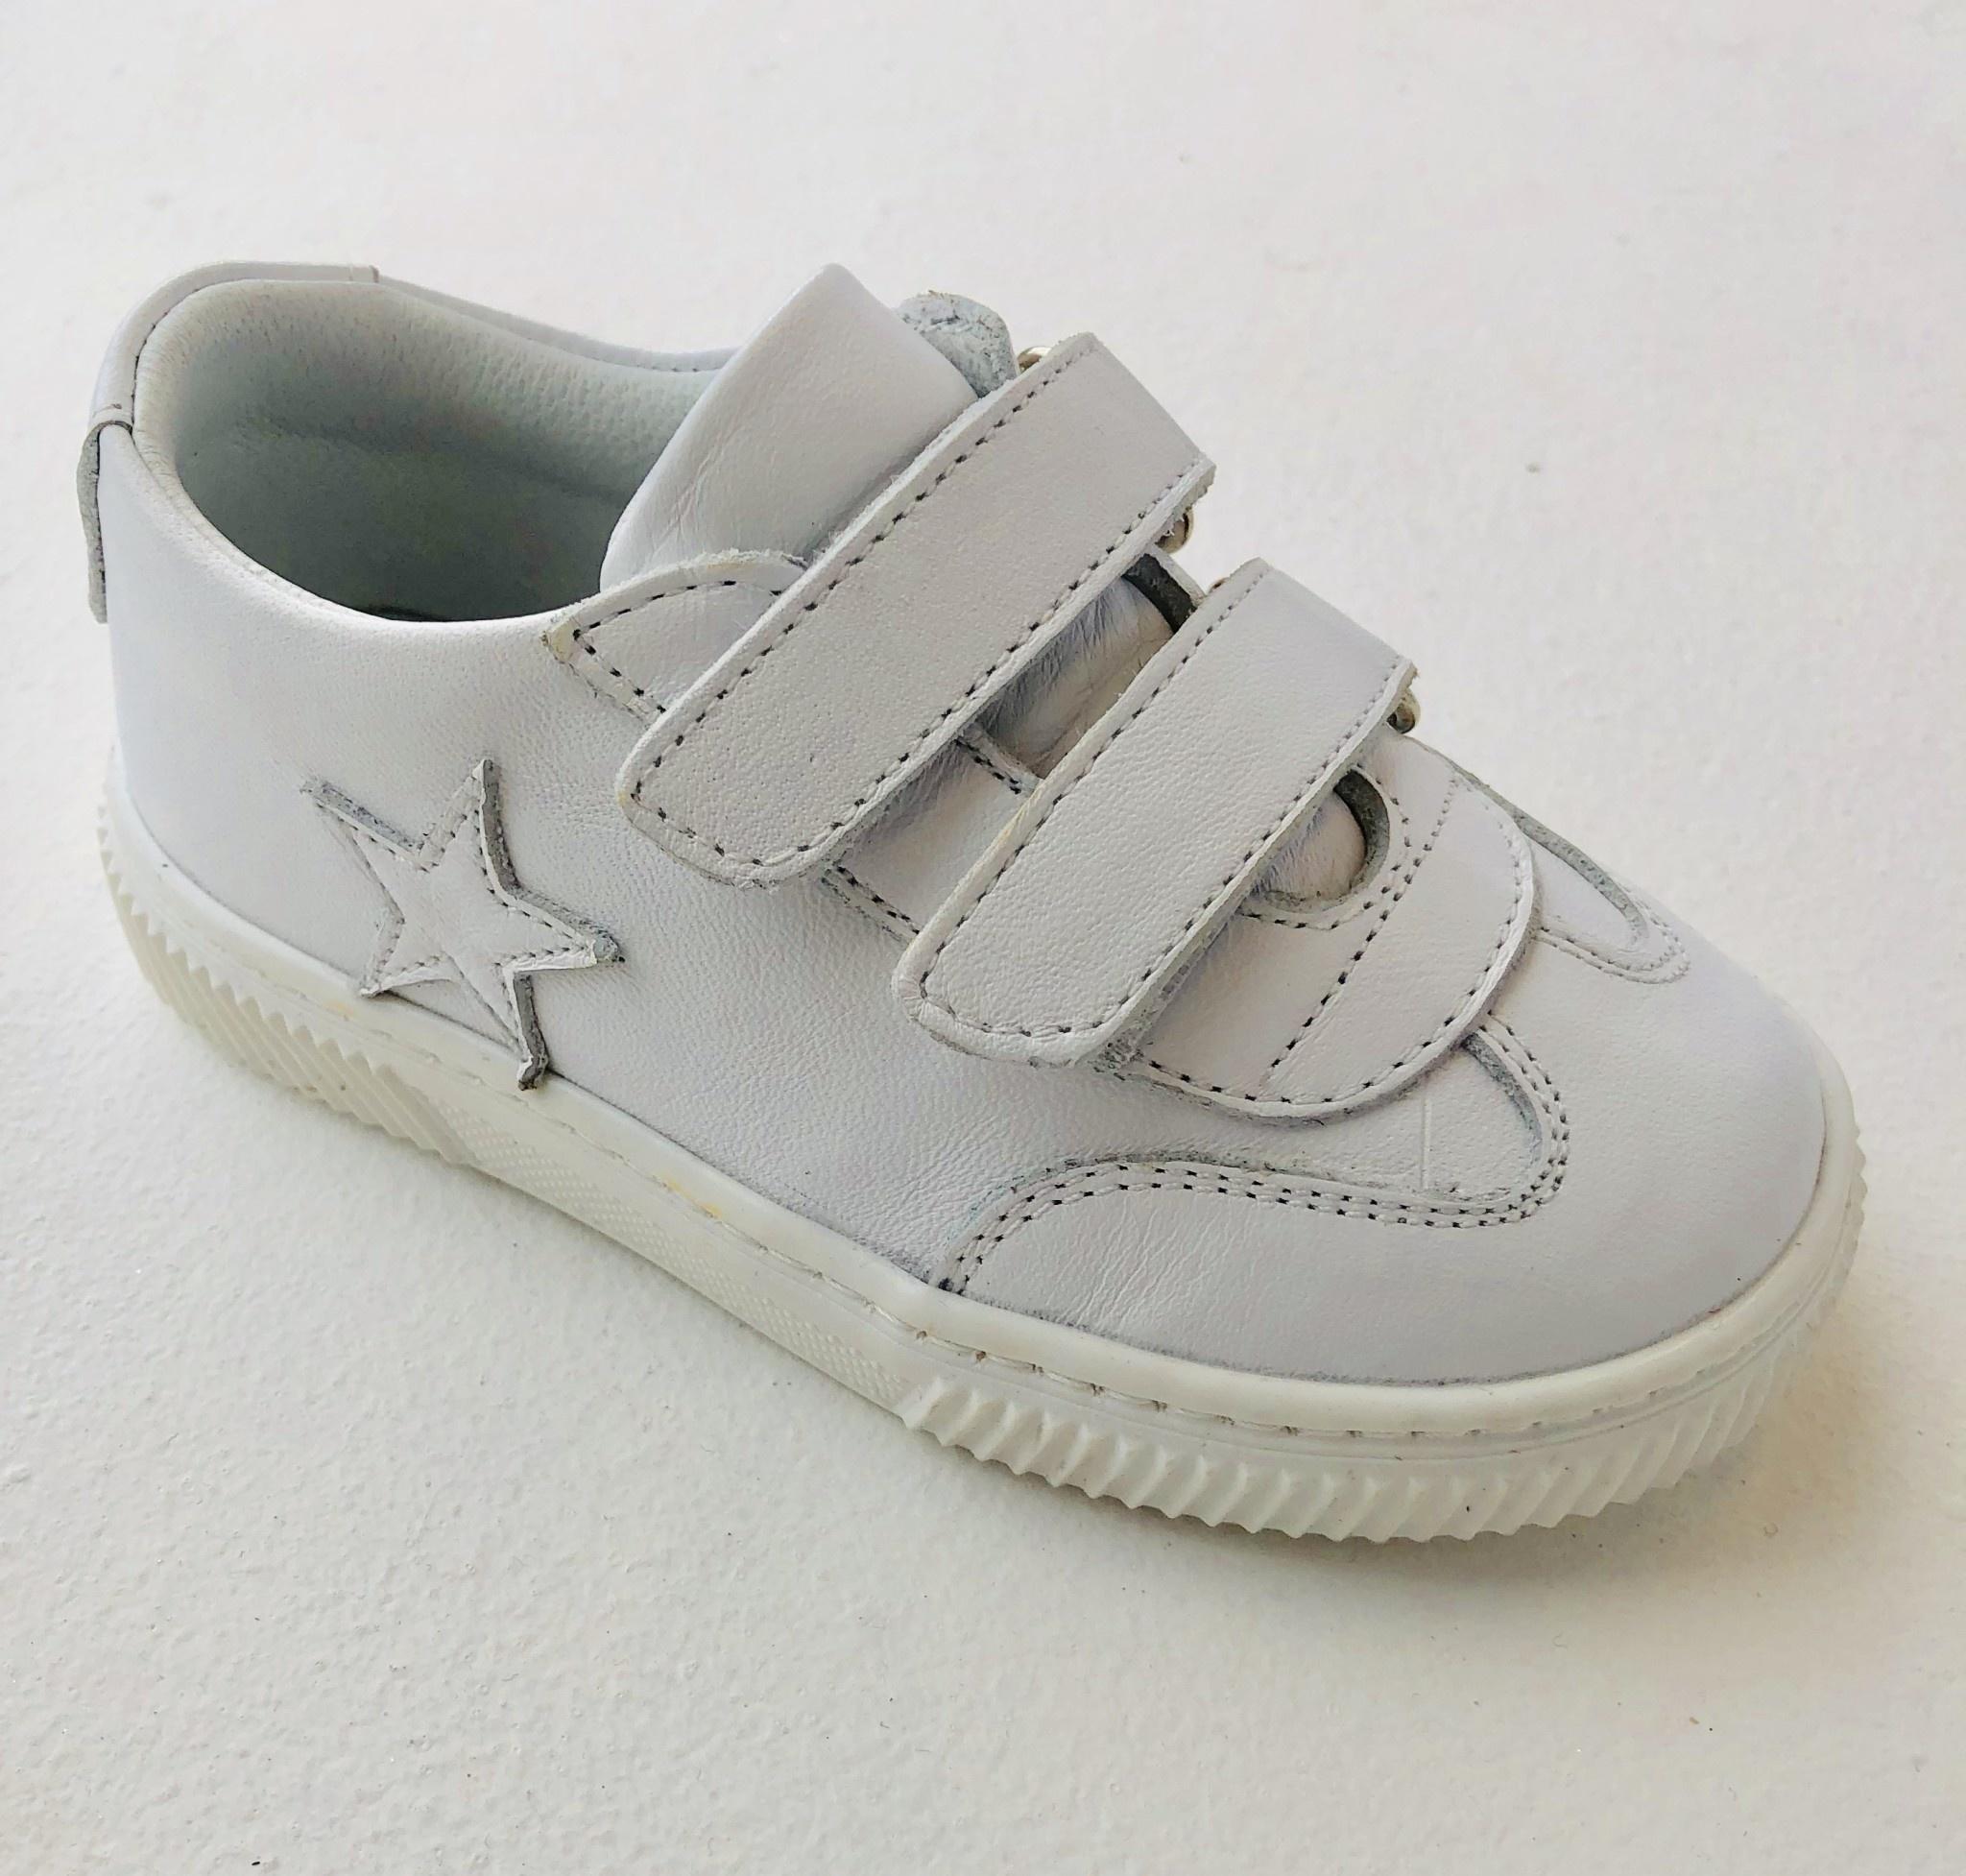 bebebia BebeBia White Leather Star Shoes